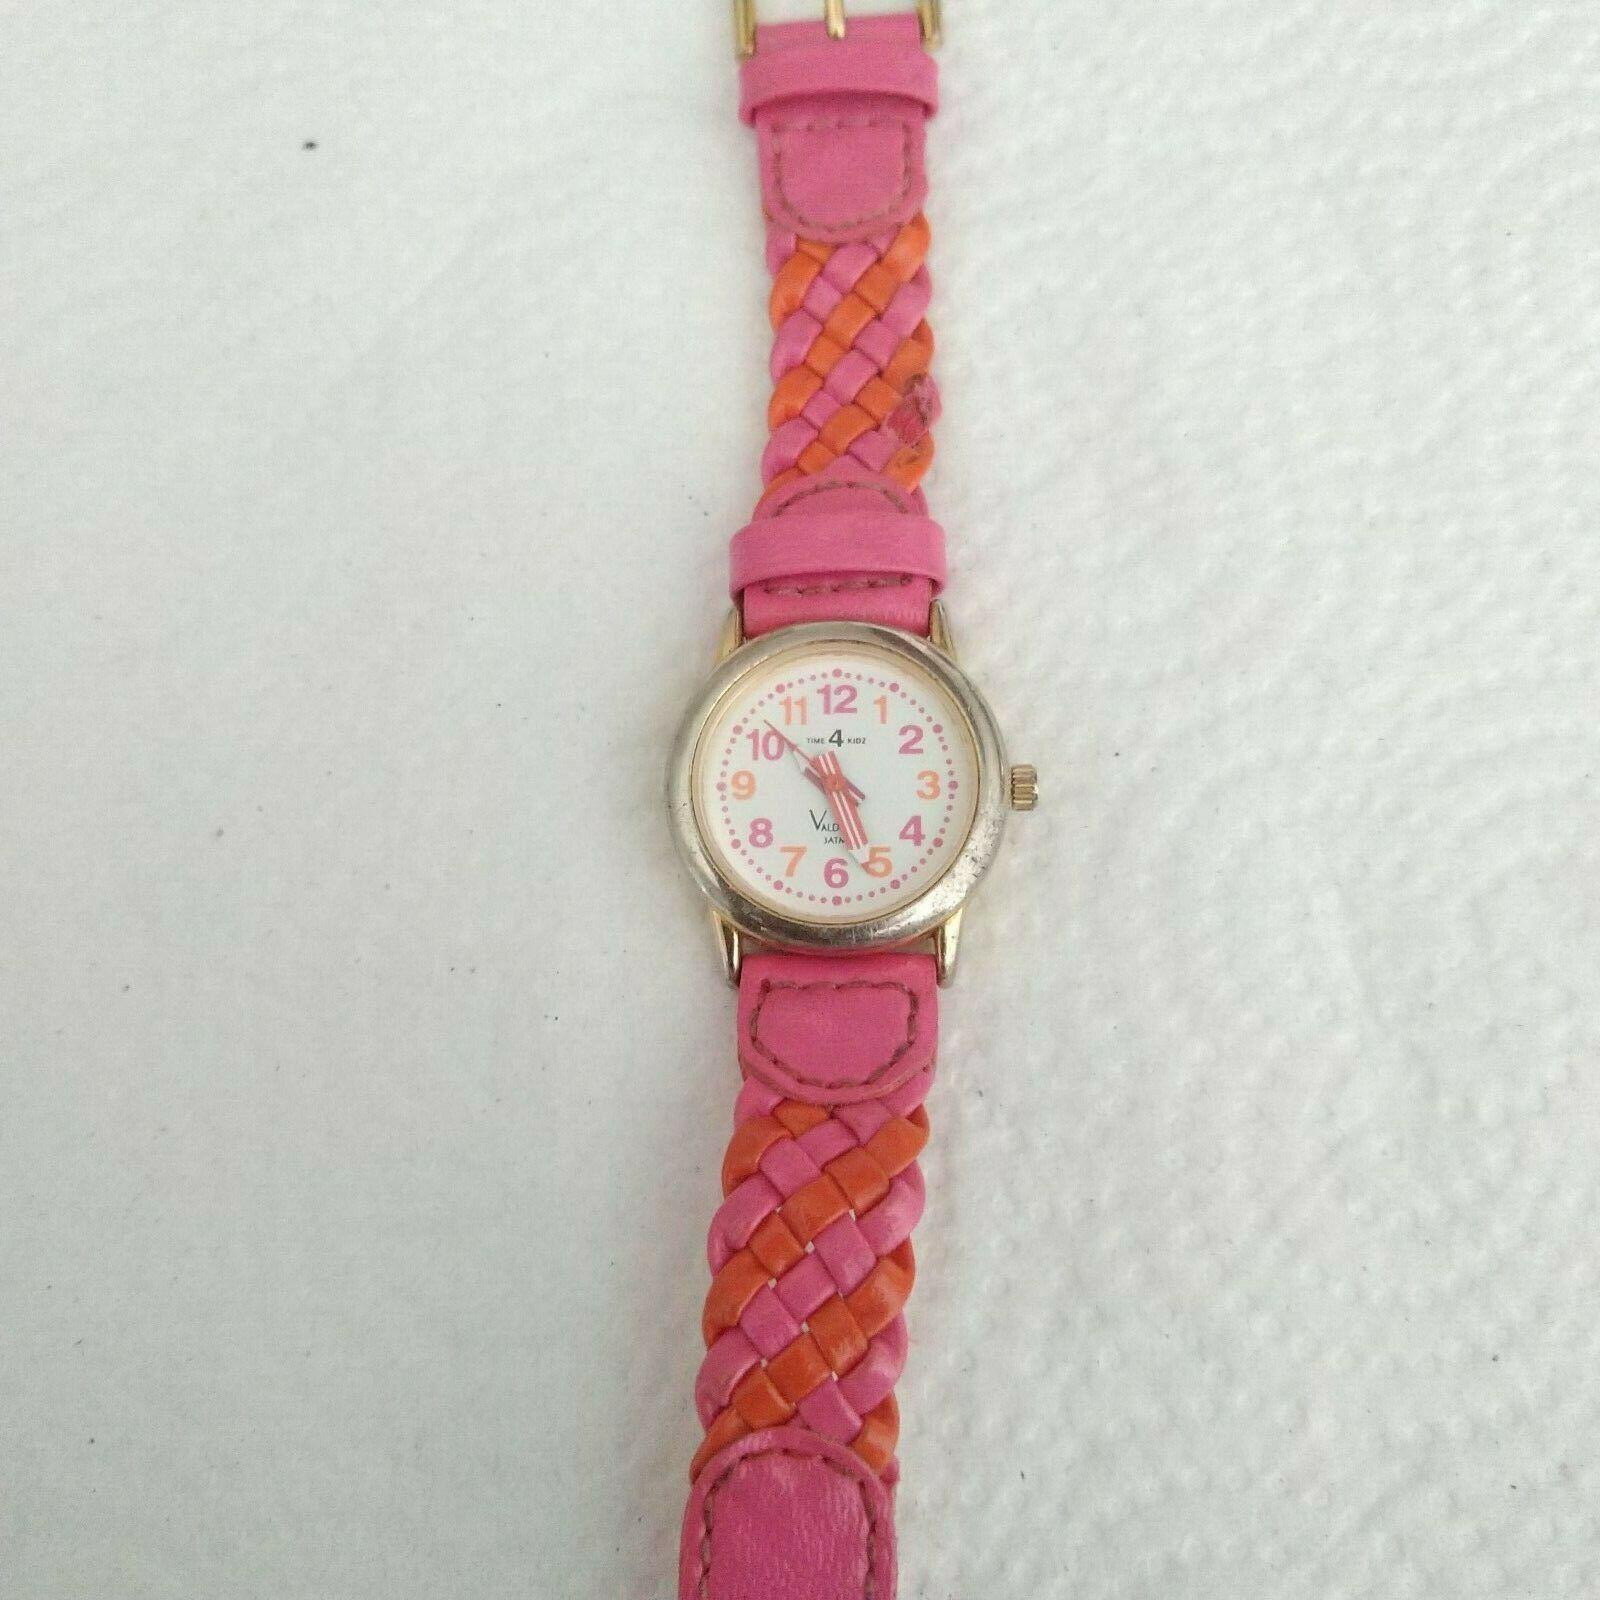 Time4Kidz Watch - Valdawn Vintage Water ressistant  Pink Leather Strap